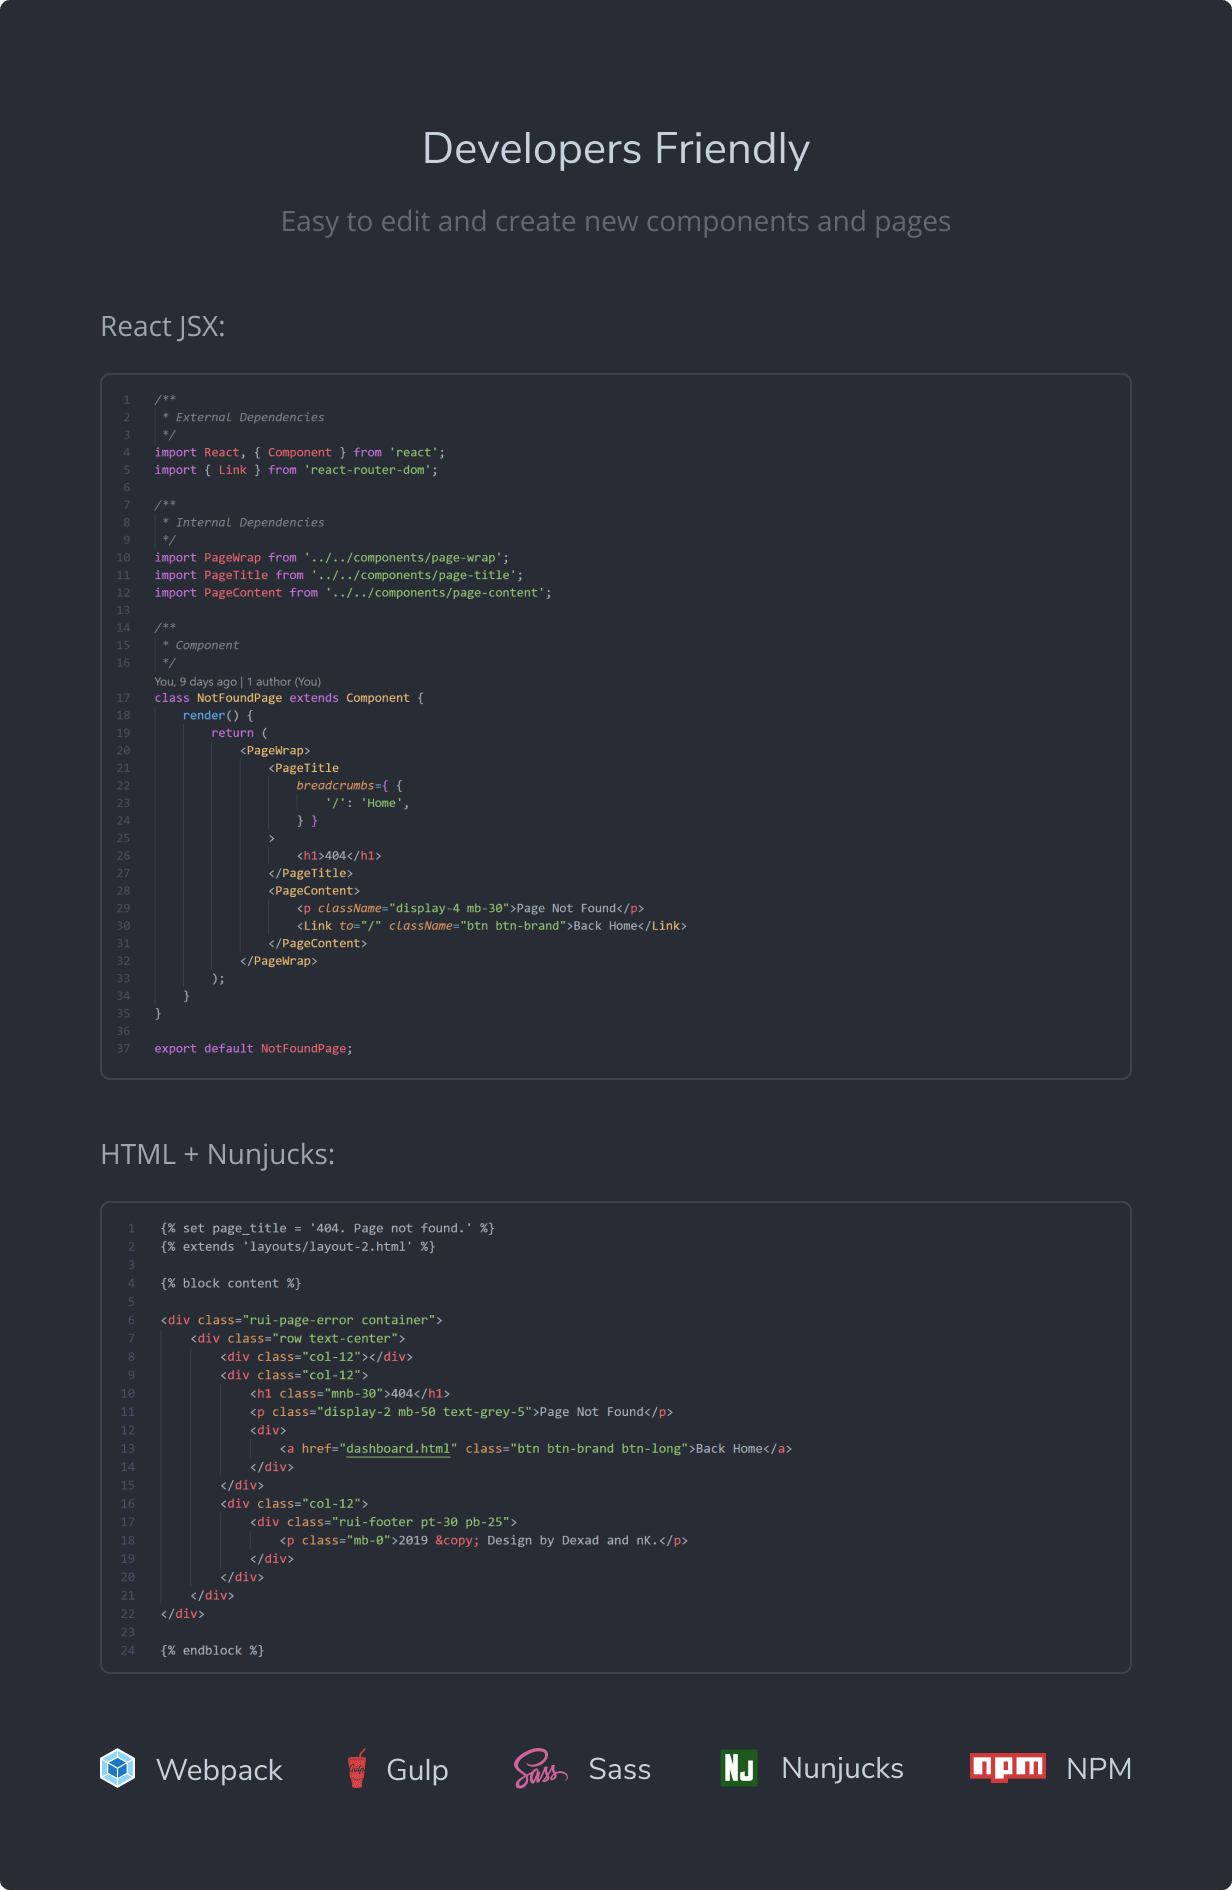 Developers Friendly